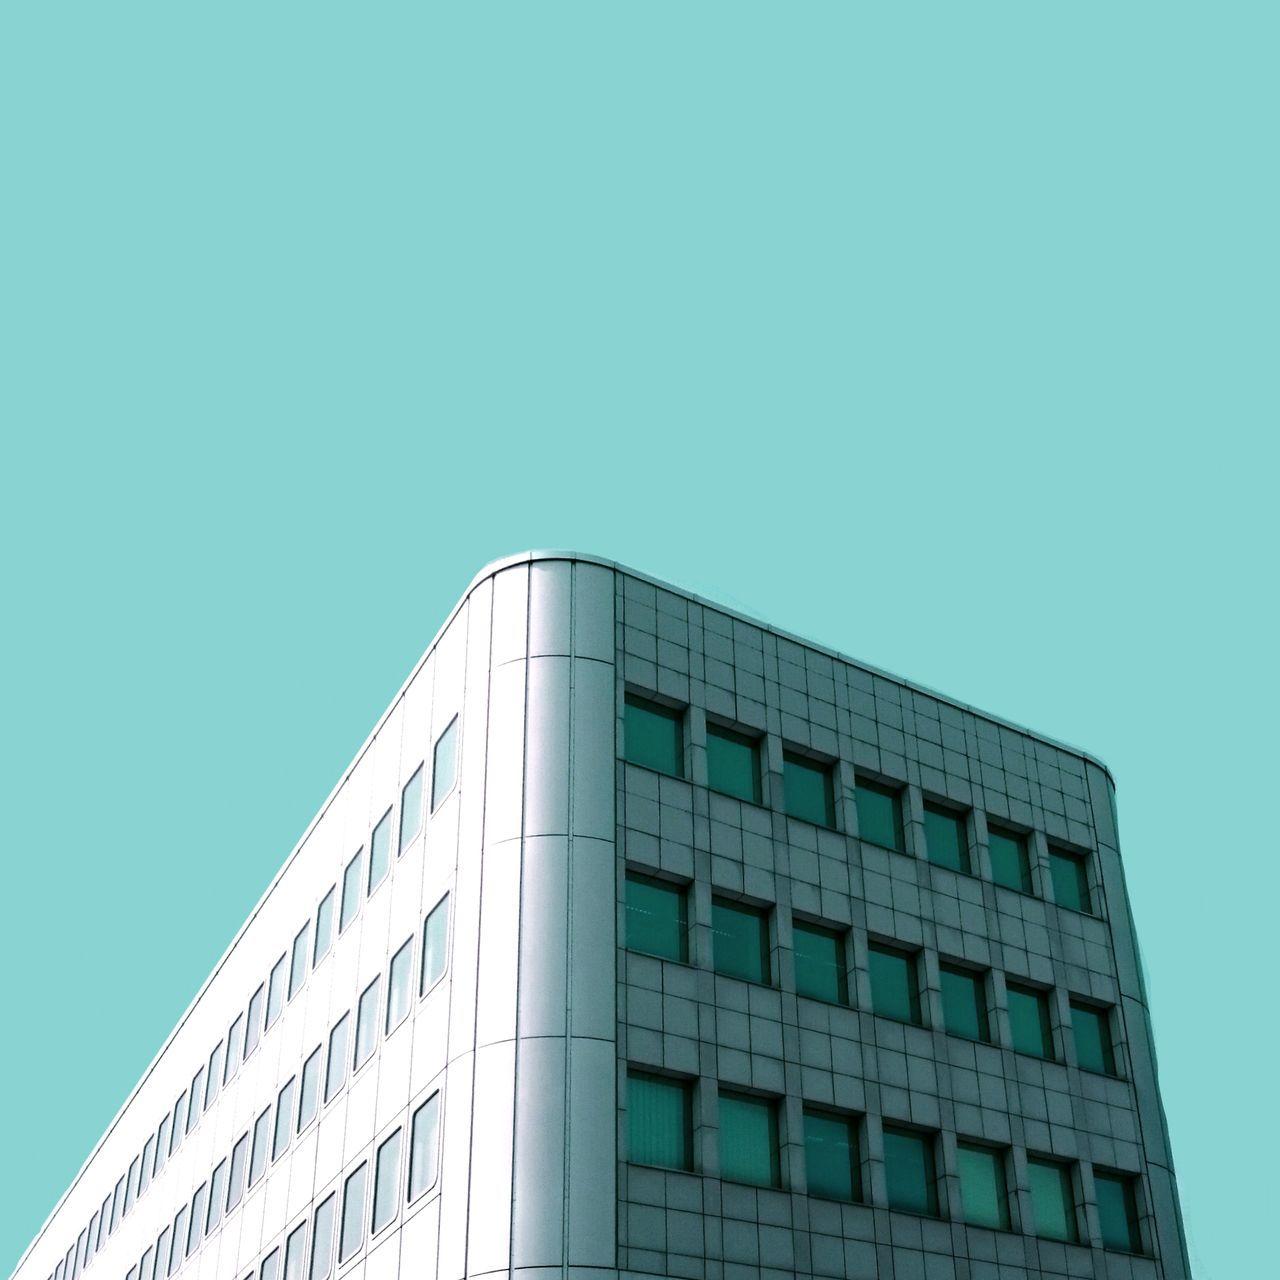 Light & Shadow. Design Germany Facades Facade Building Symmetrical Art Architecture Symmetry Minimal Minimalism Lines Structures Architecturelovers ARCHITECT Düsseldorf